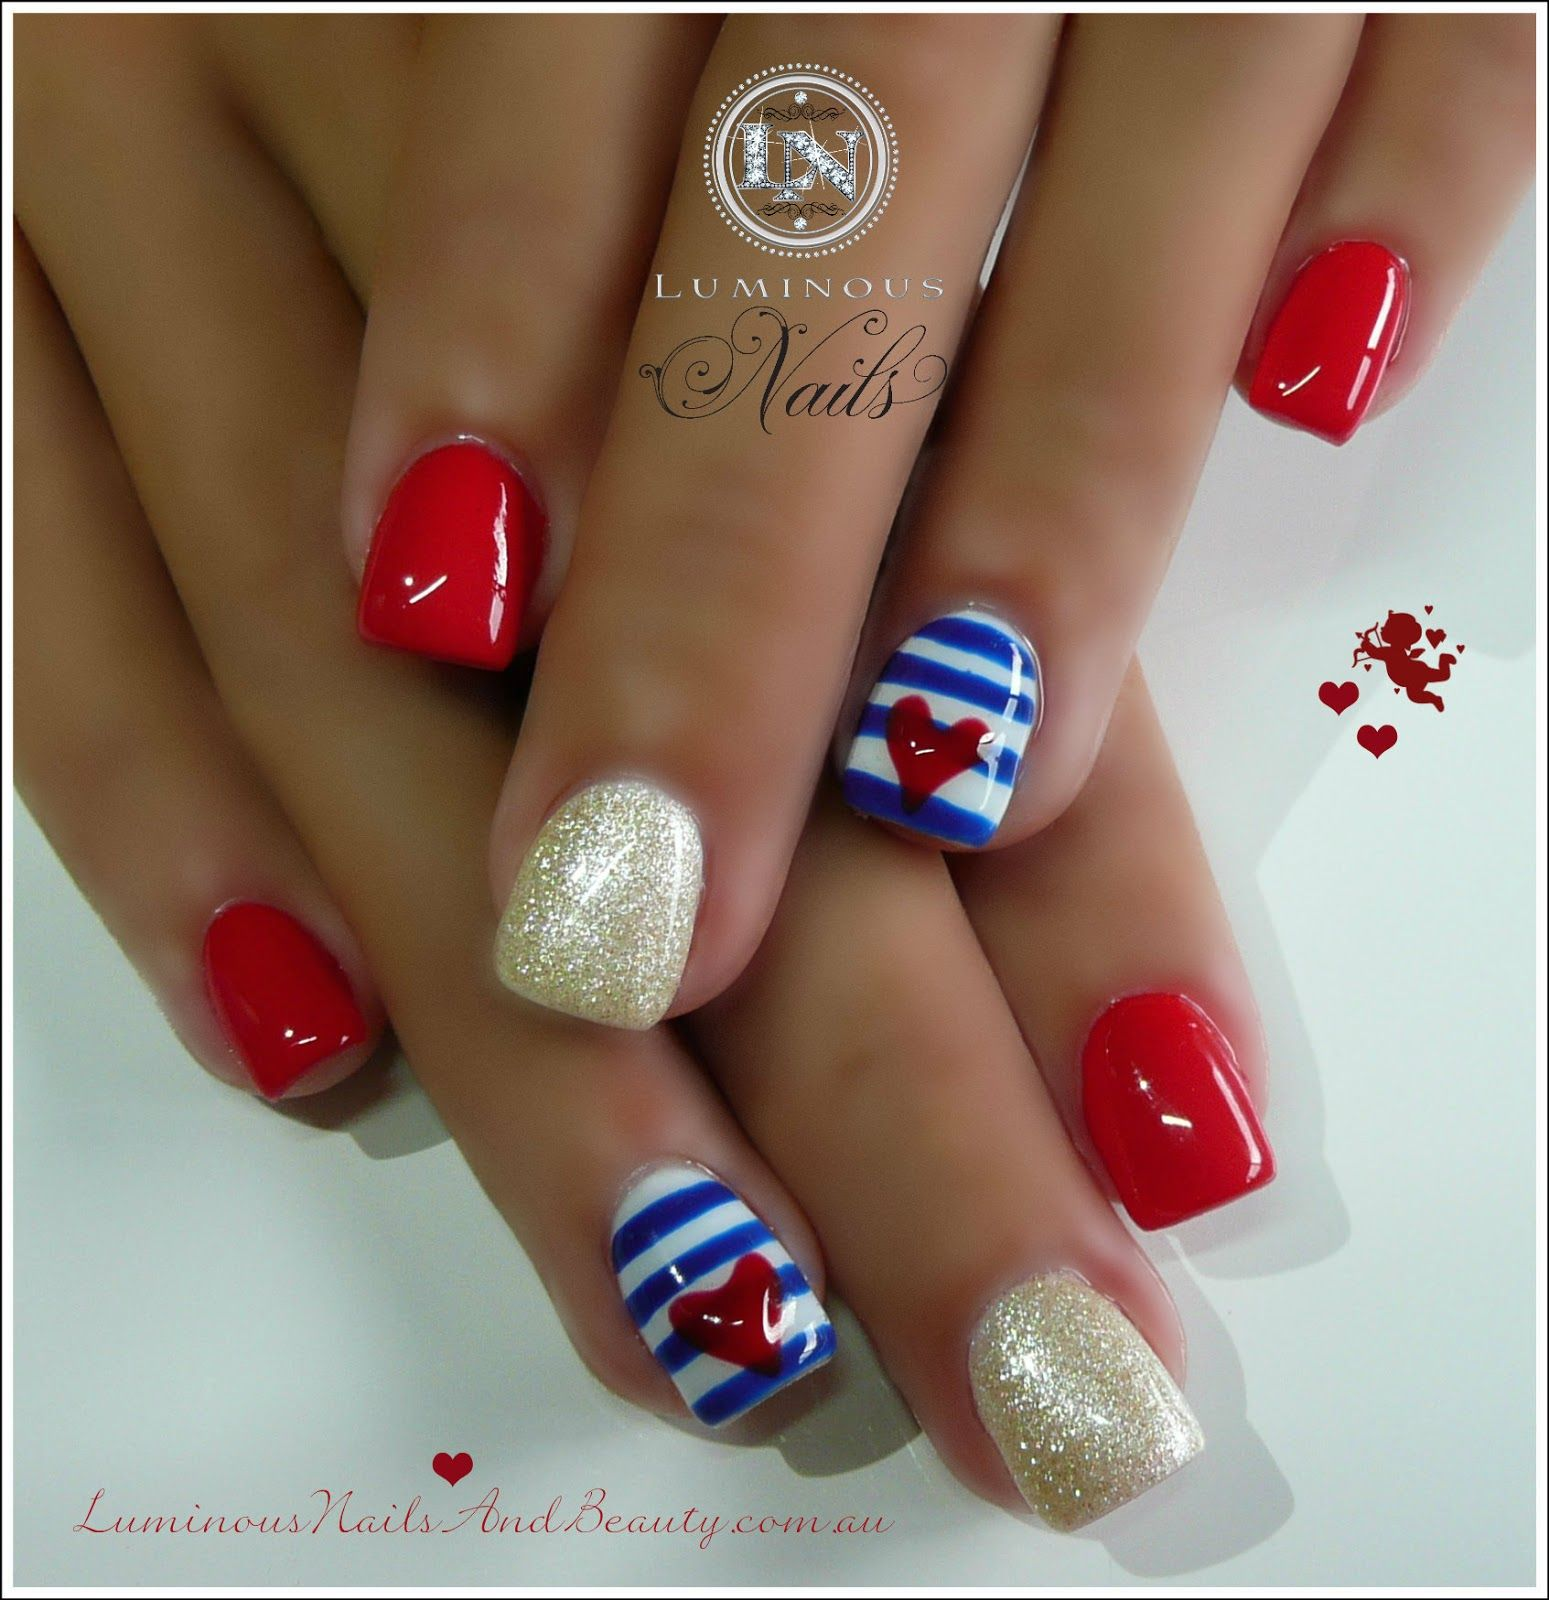 Acrylic+Nail+Designs | acrylic nails 252 (Fullsize → 1549 x 1600 ...